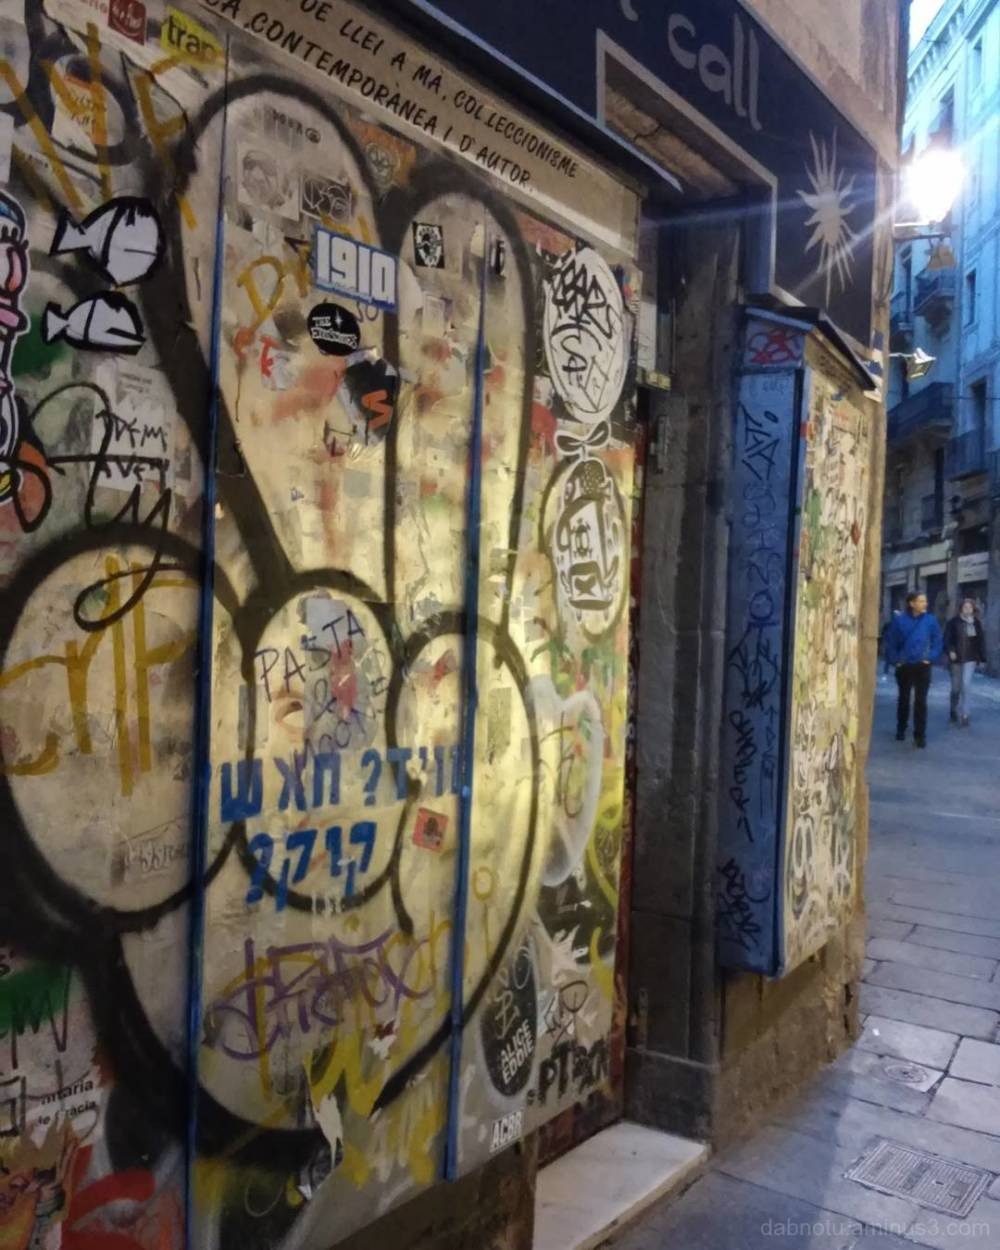 Unedited Barcelona smart/street photography!